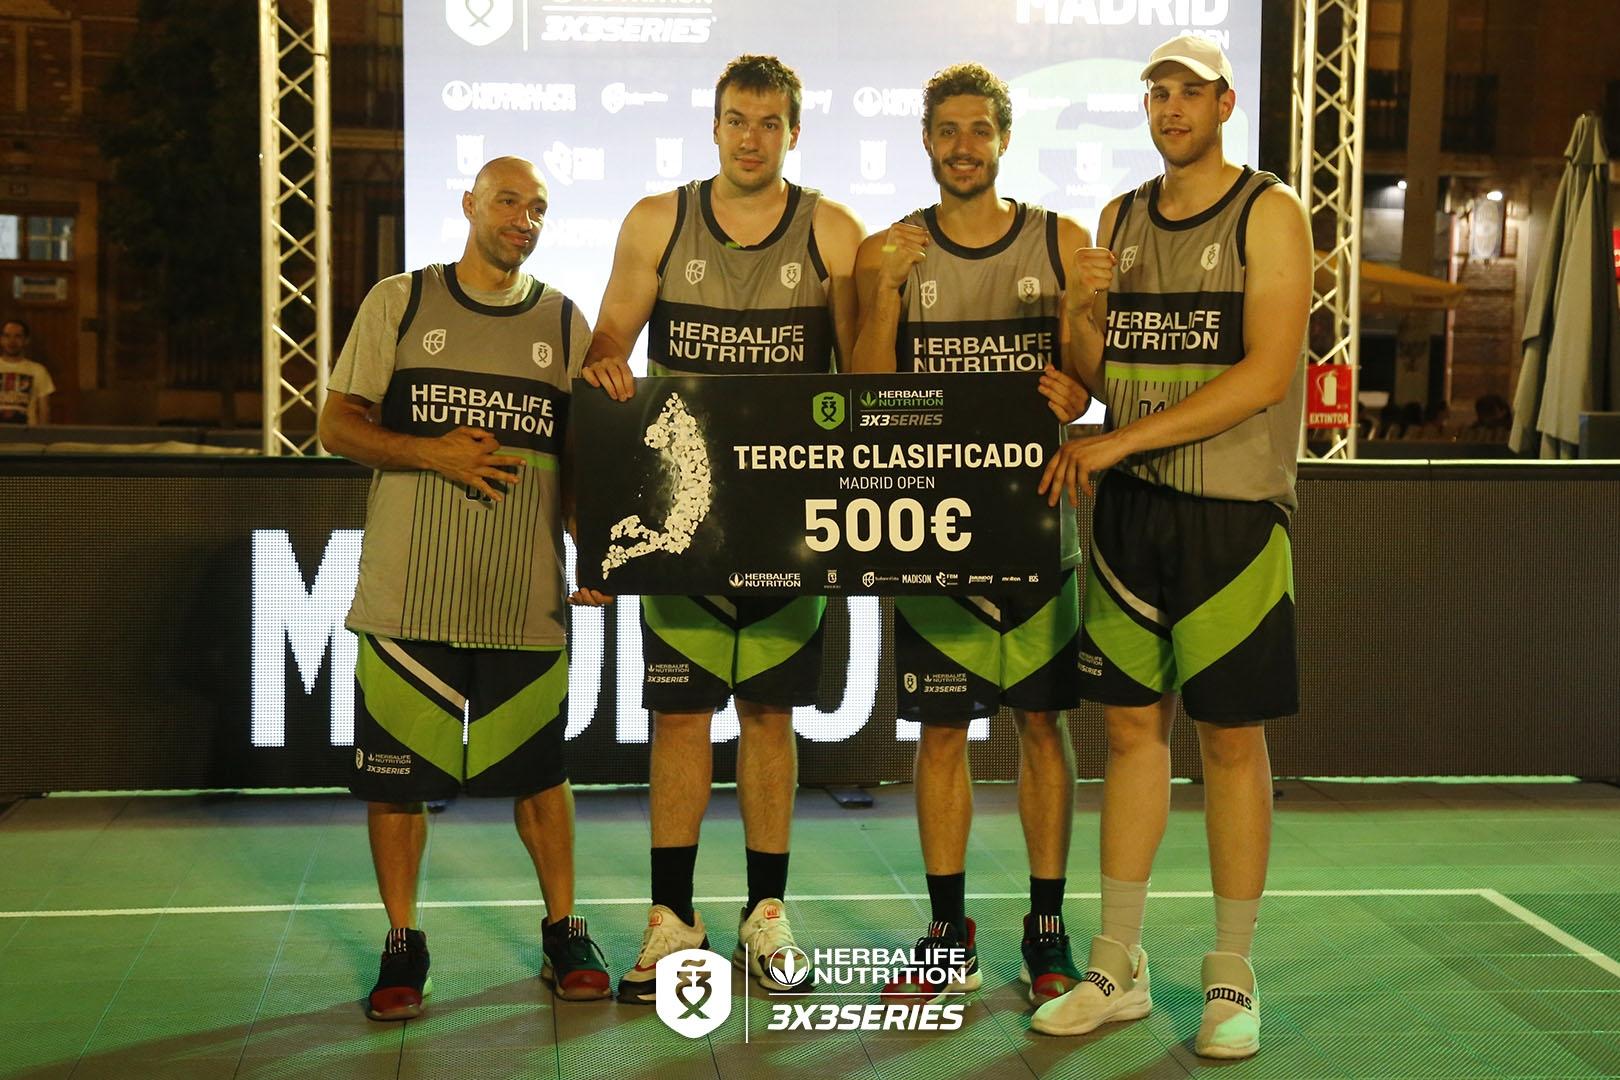 MadridOpen_Herbalife3x3Series2019_SABADO16